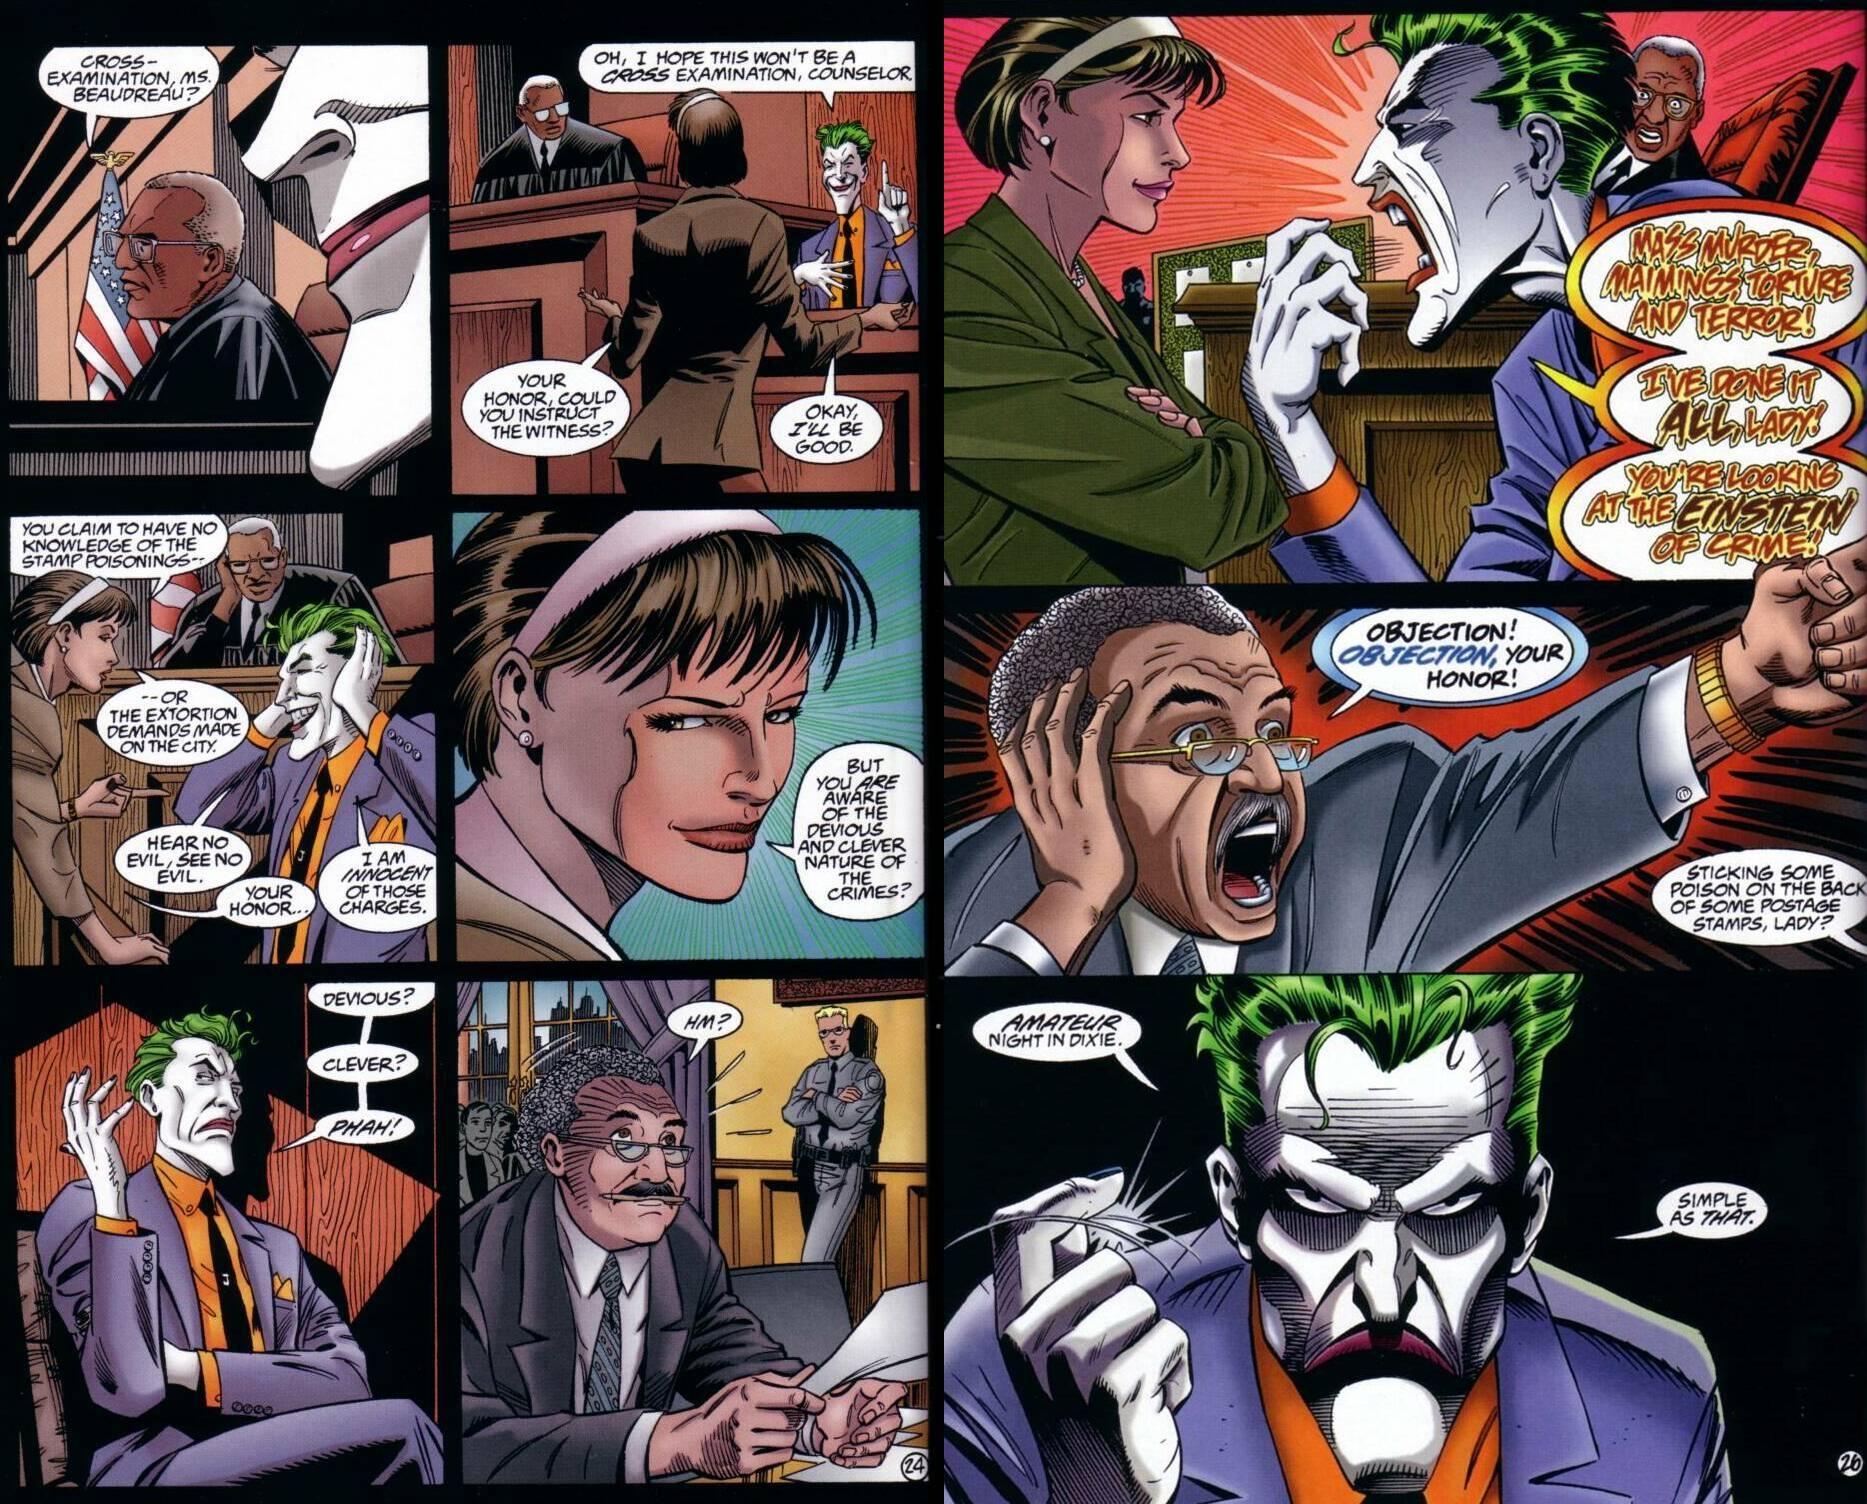 The Joker - Devil's Advocate review